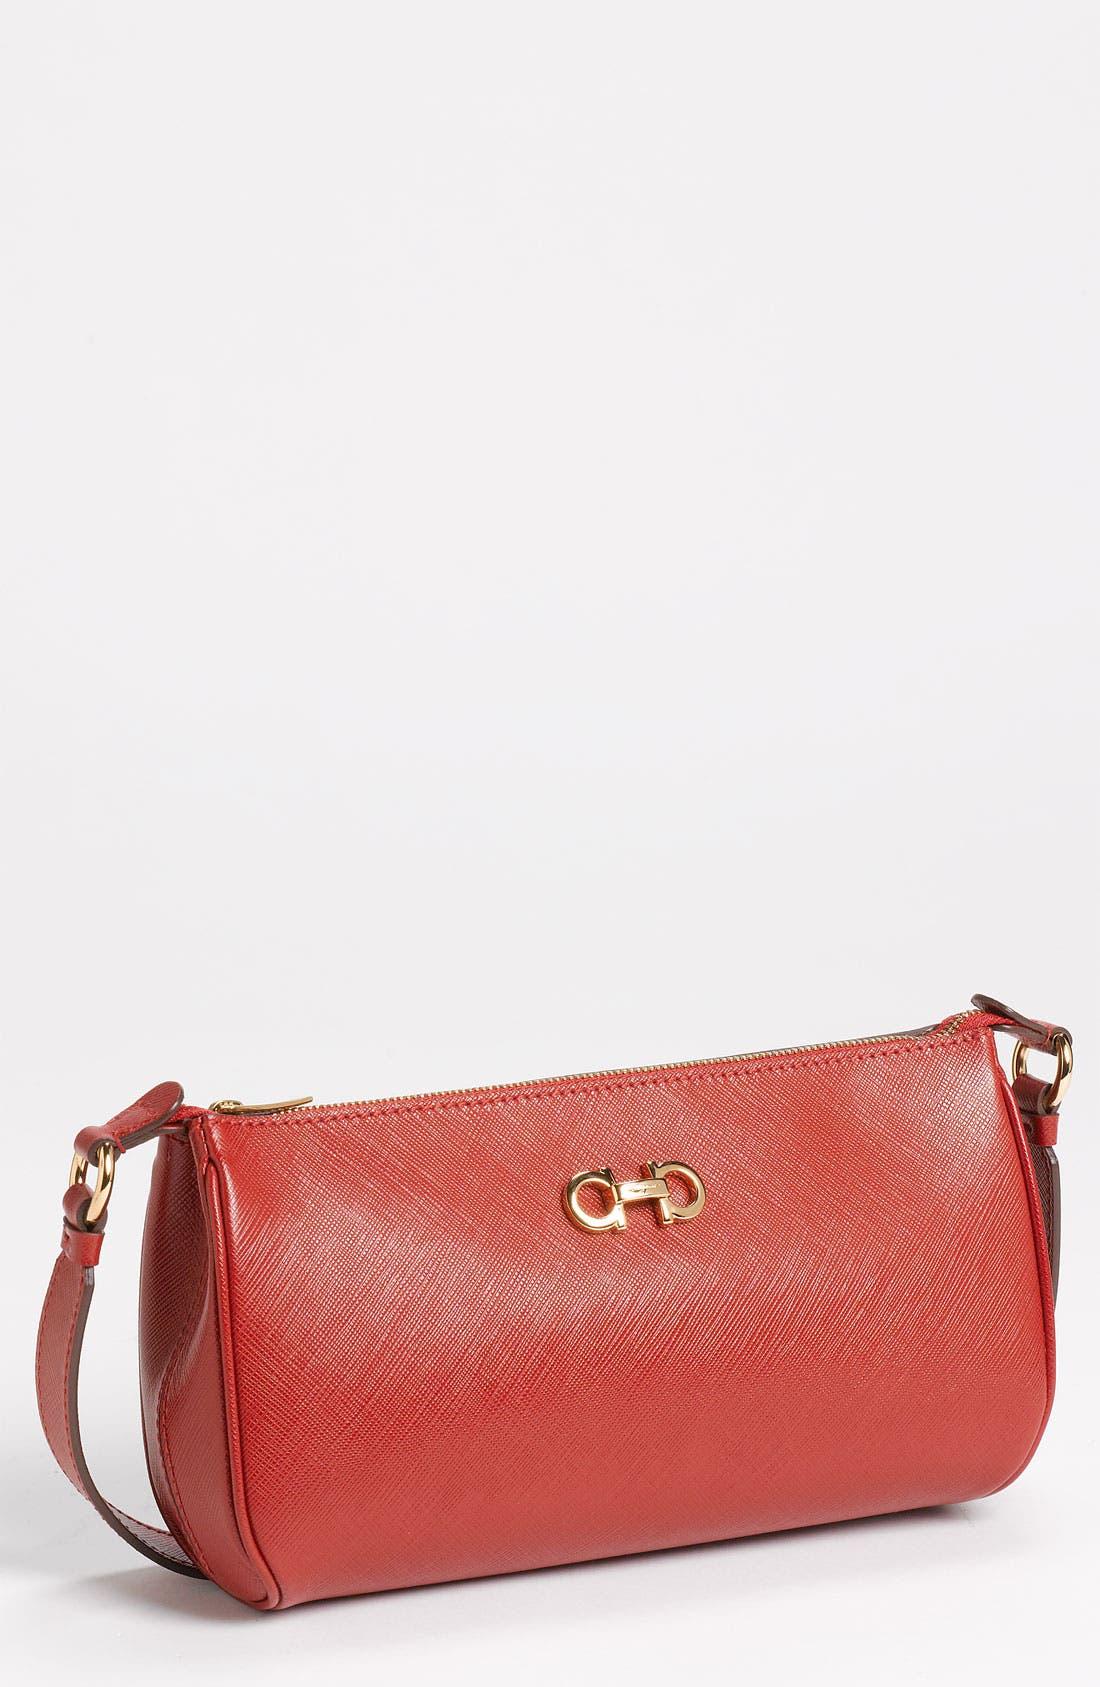 Alternate Image 1 Selected - Salvatore Ferragamo 'Icona Lisetta' Shoulder Bag